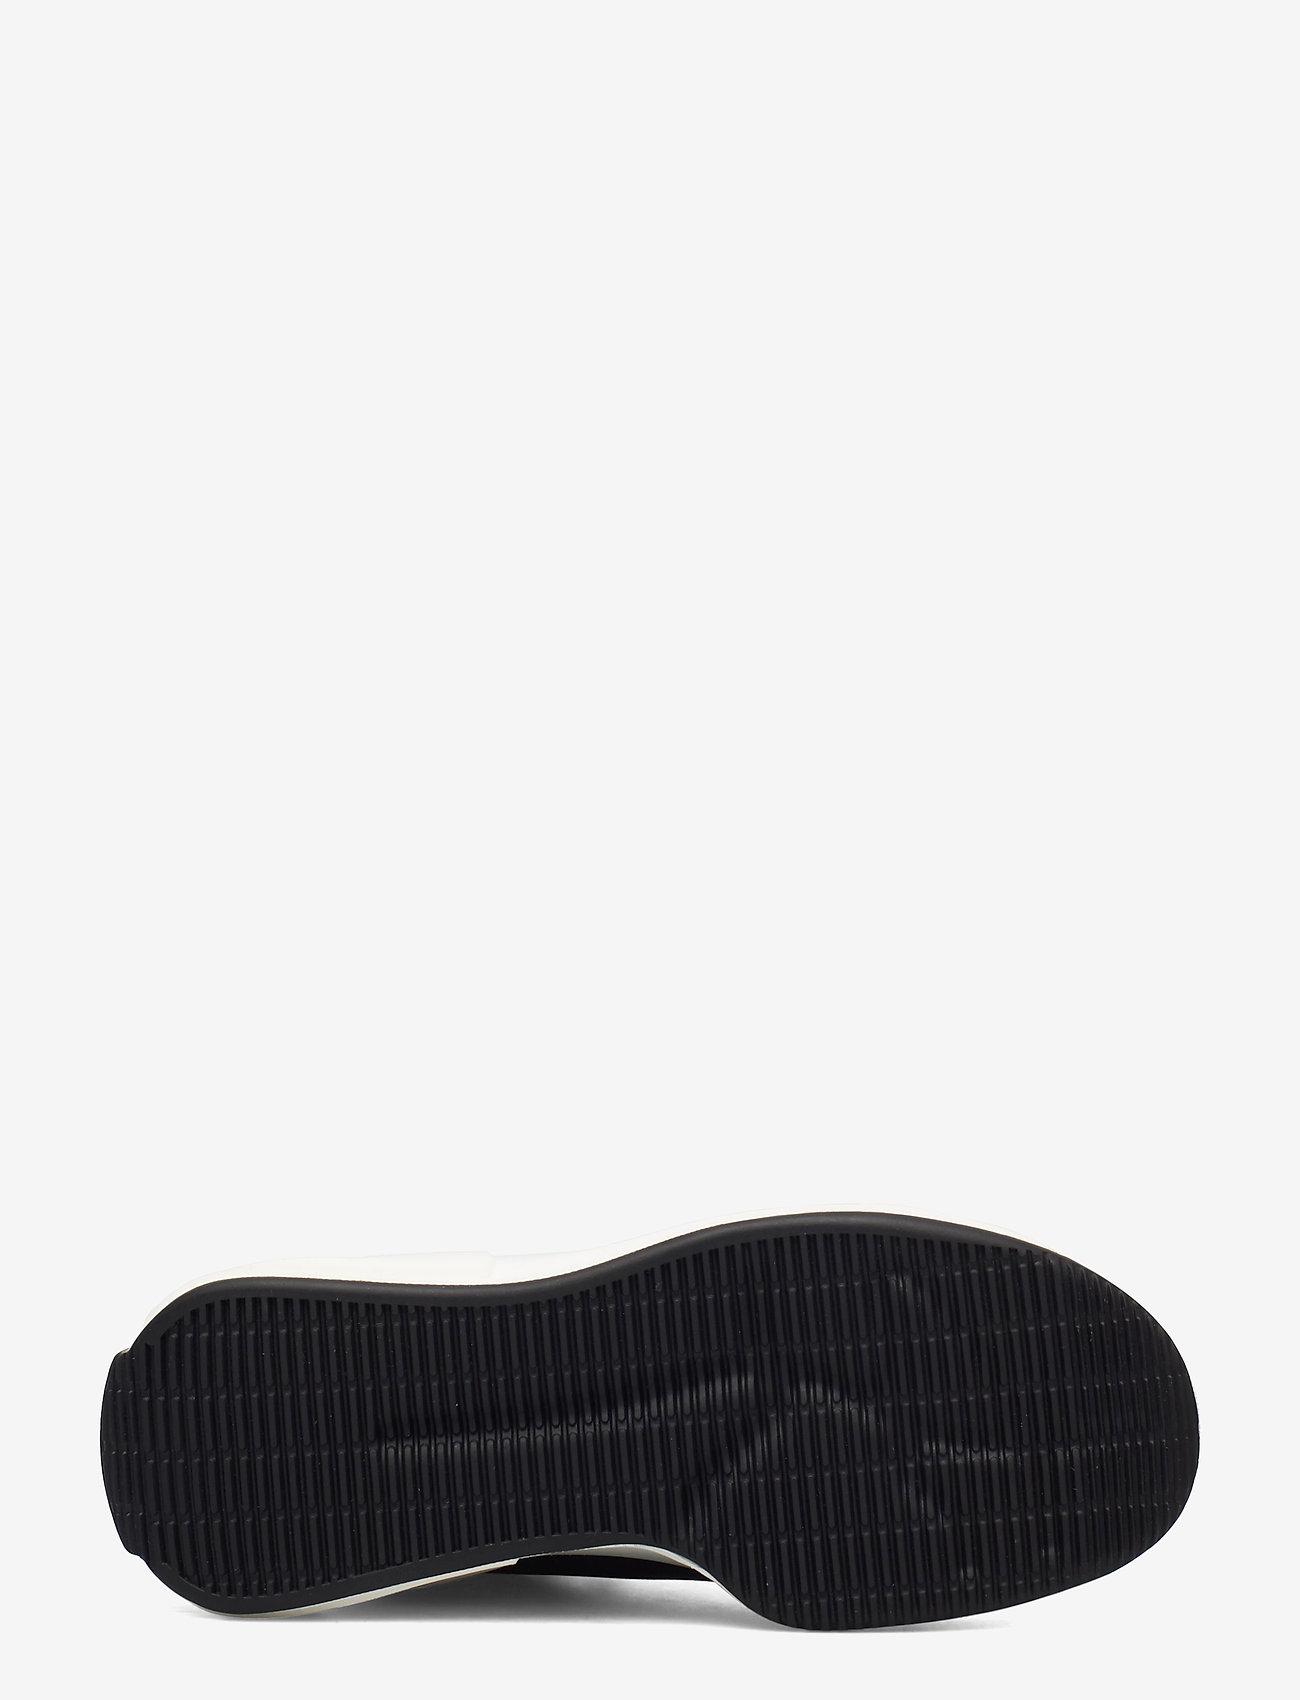 adidas by Stella McCartney - aSMC Treino Mid - high top sneakers - cblack/clowhi/owhite - 4